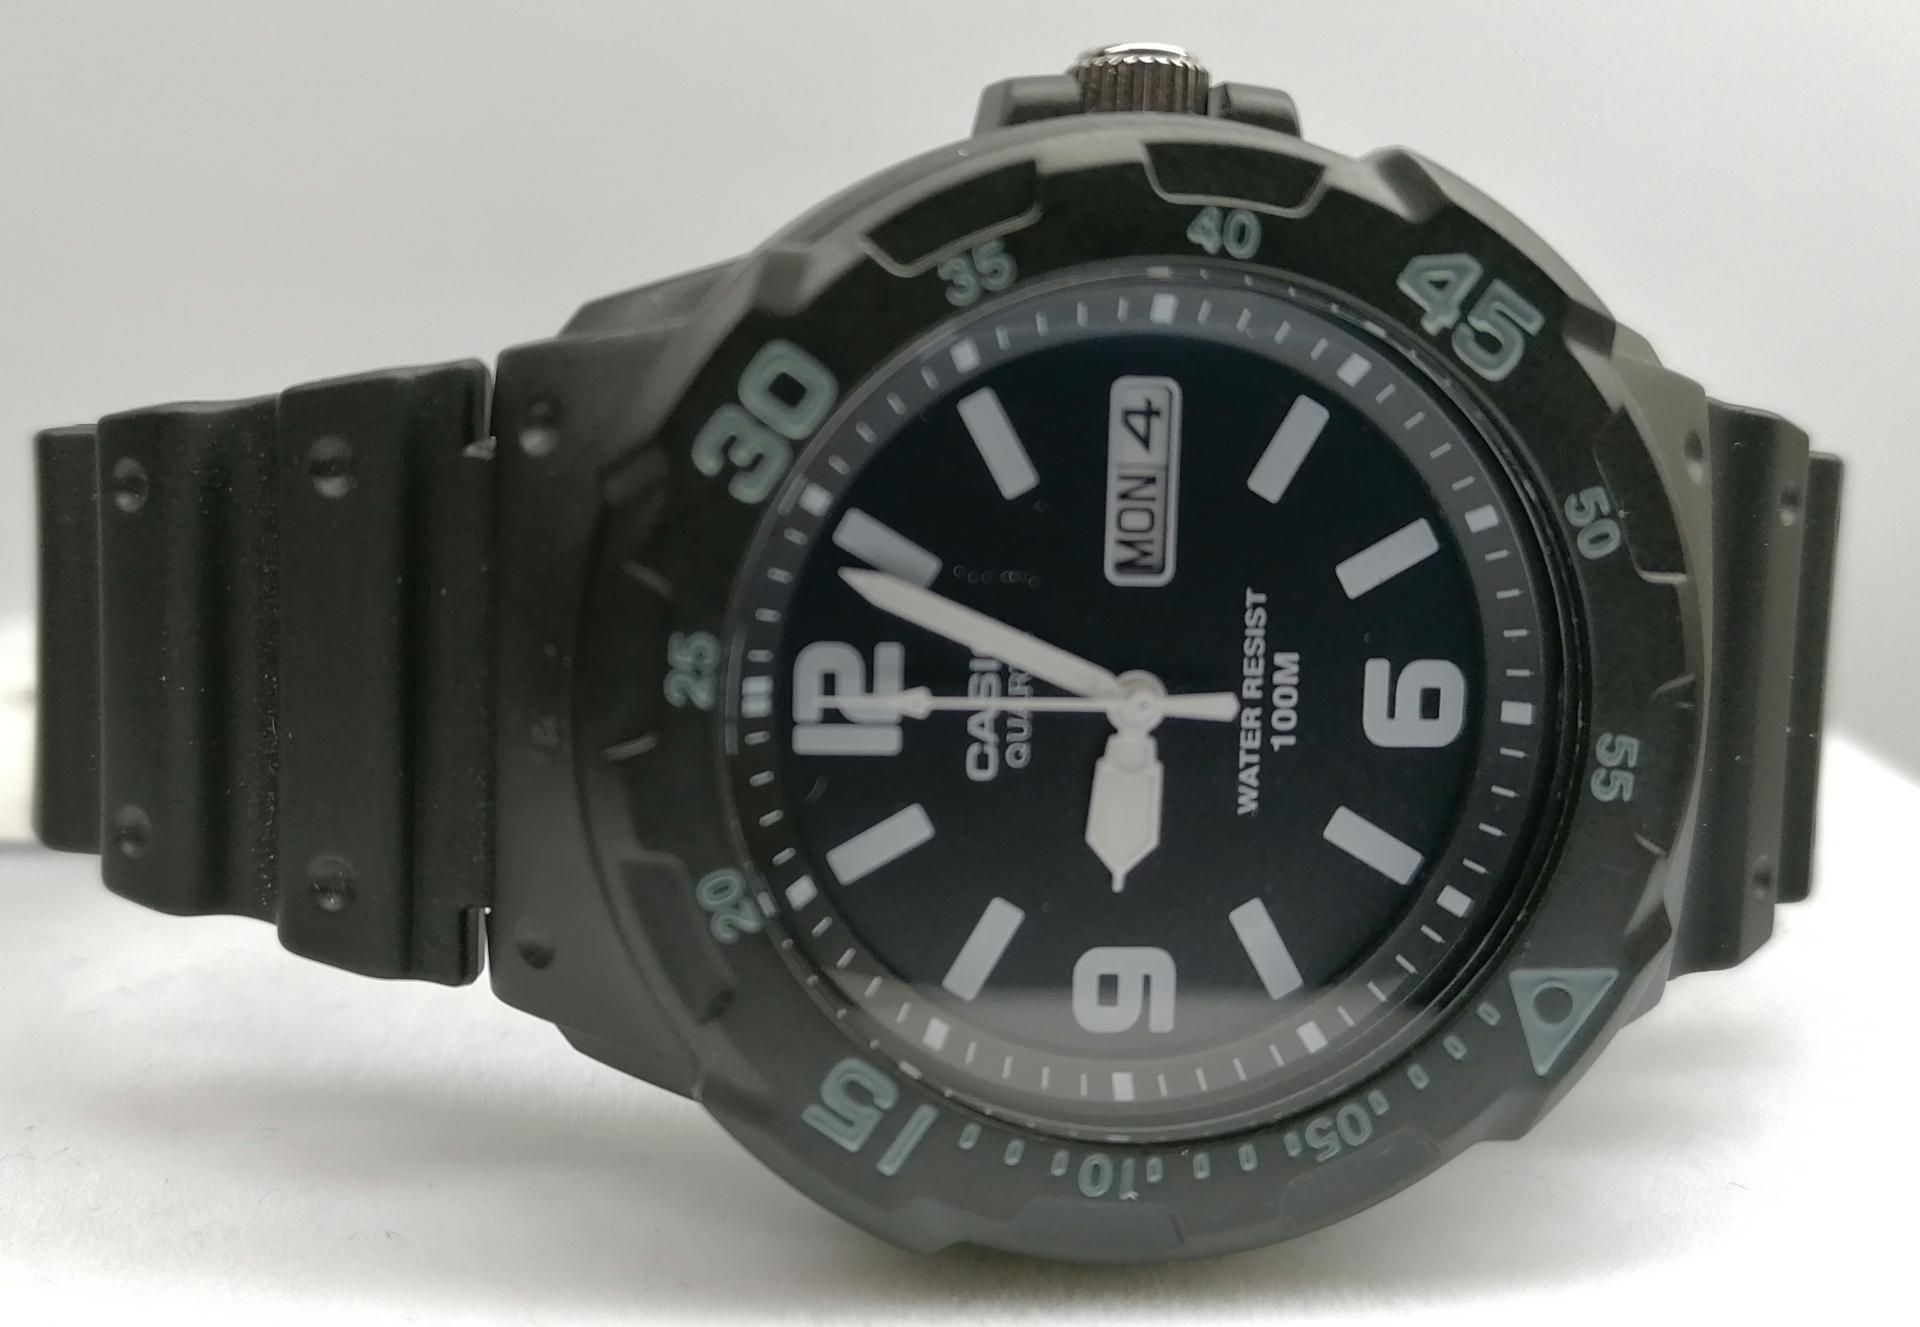 Reloj Casio Hombre Analogico Deportivo MRW-200H-1B2VDF